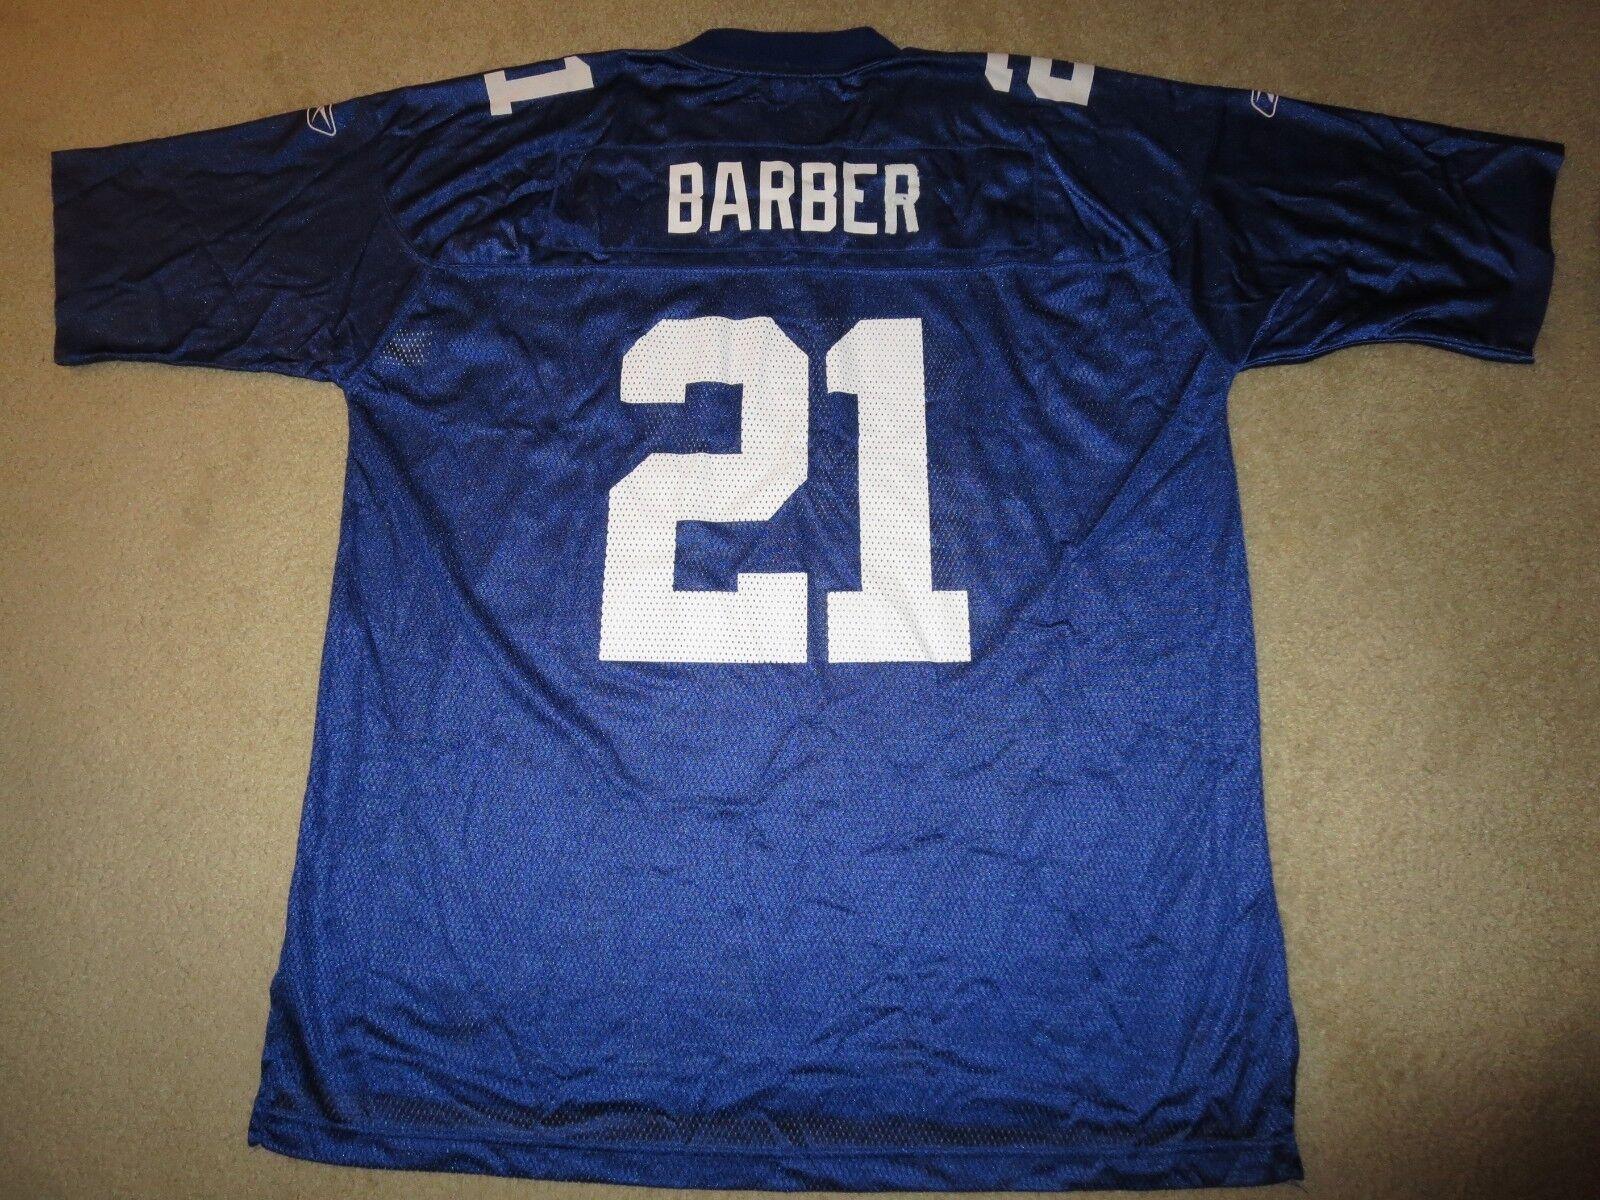 Tiki Friseur  21 21 21 New York Giants NFL Reebok Trikot 2XL 2x Rookie Herren ae2e27